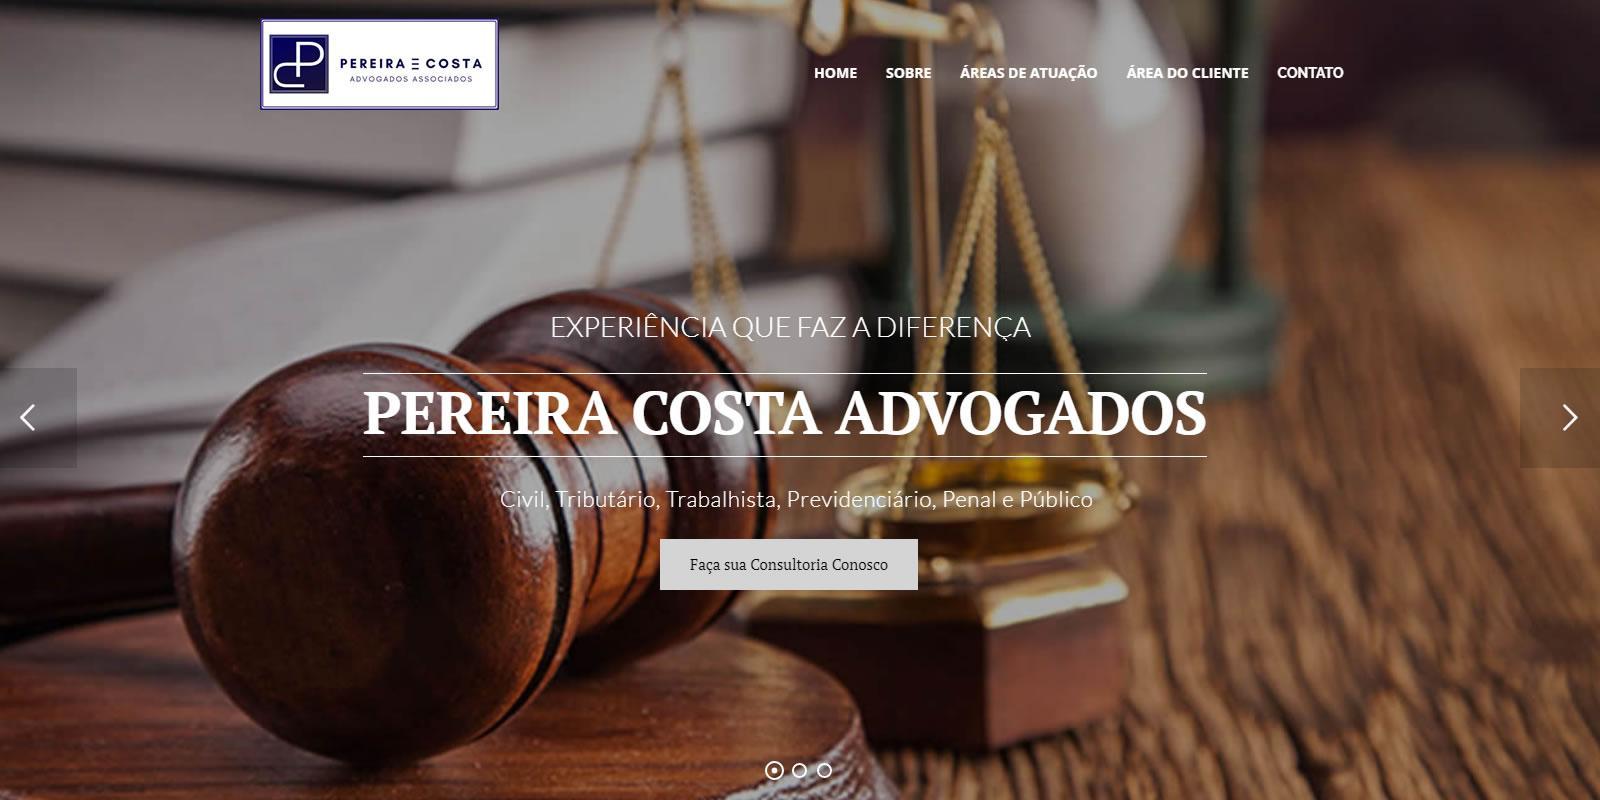 Pereira Costa Advogados Associados